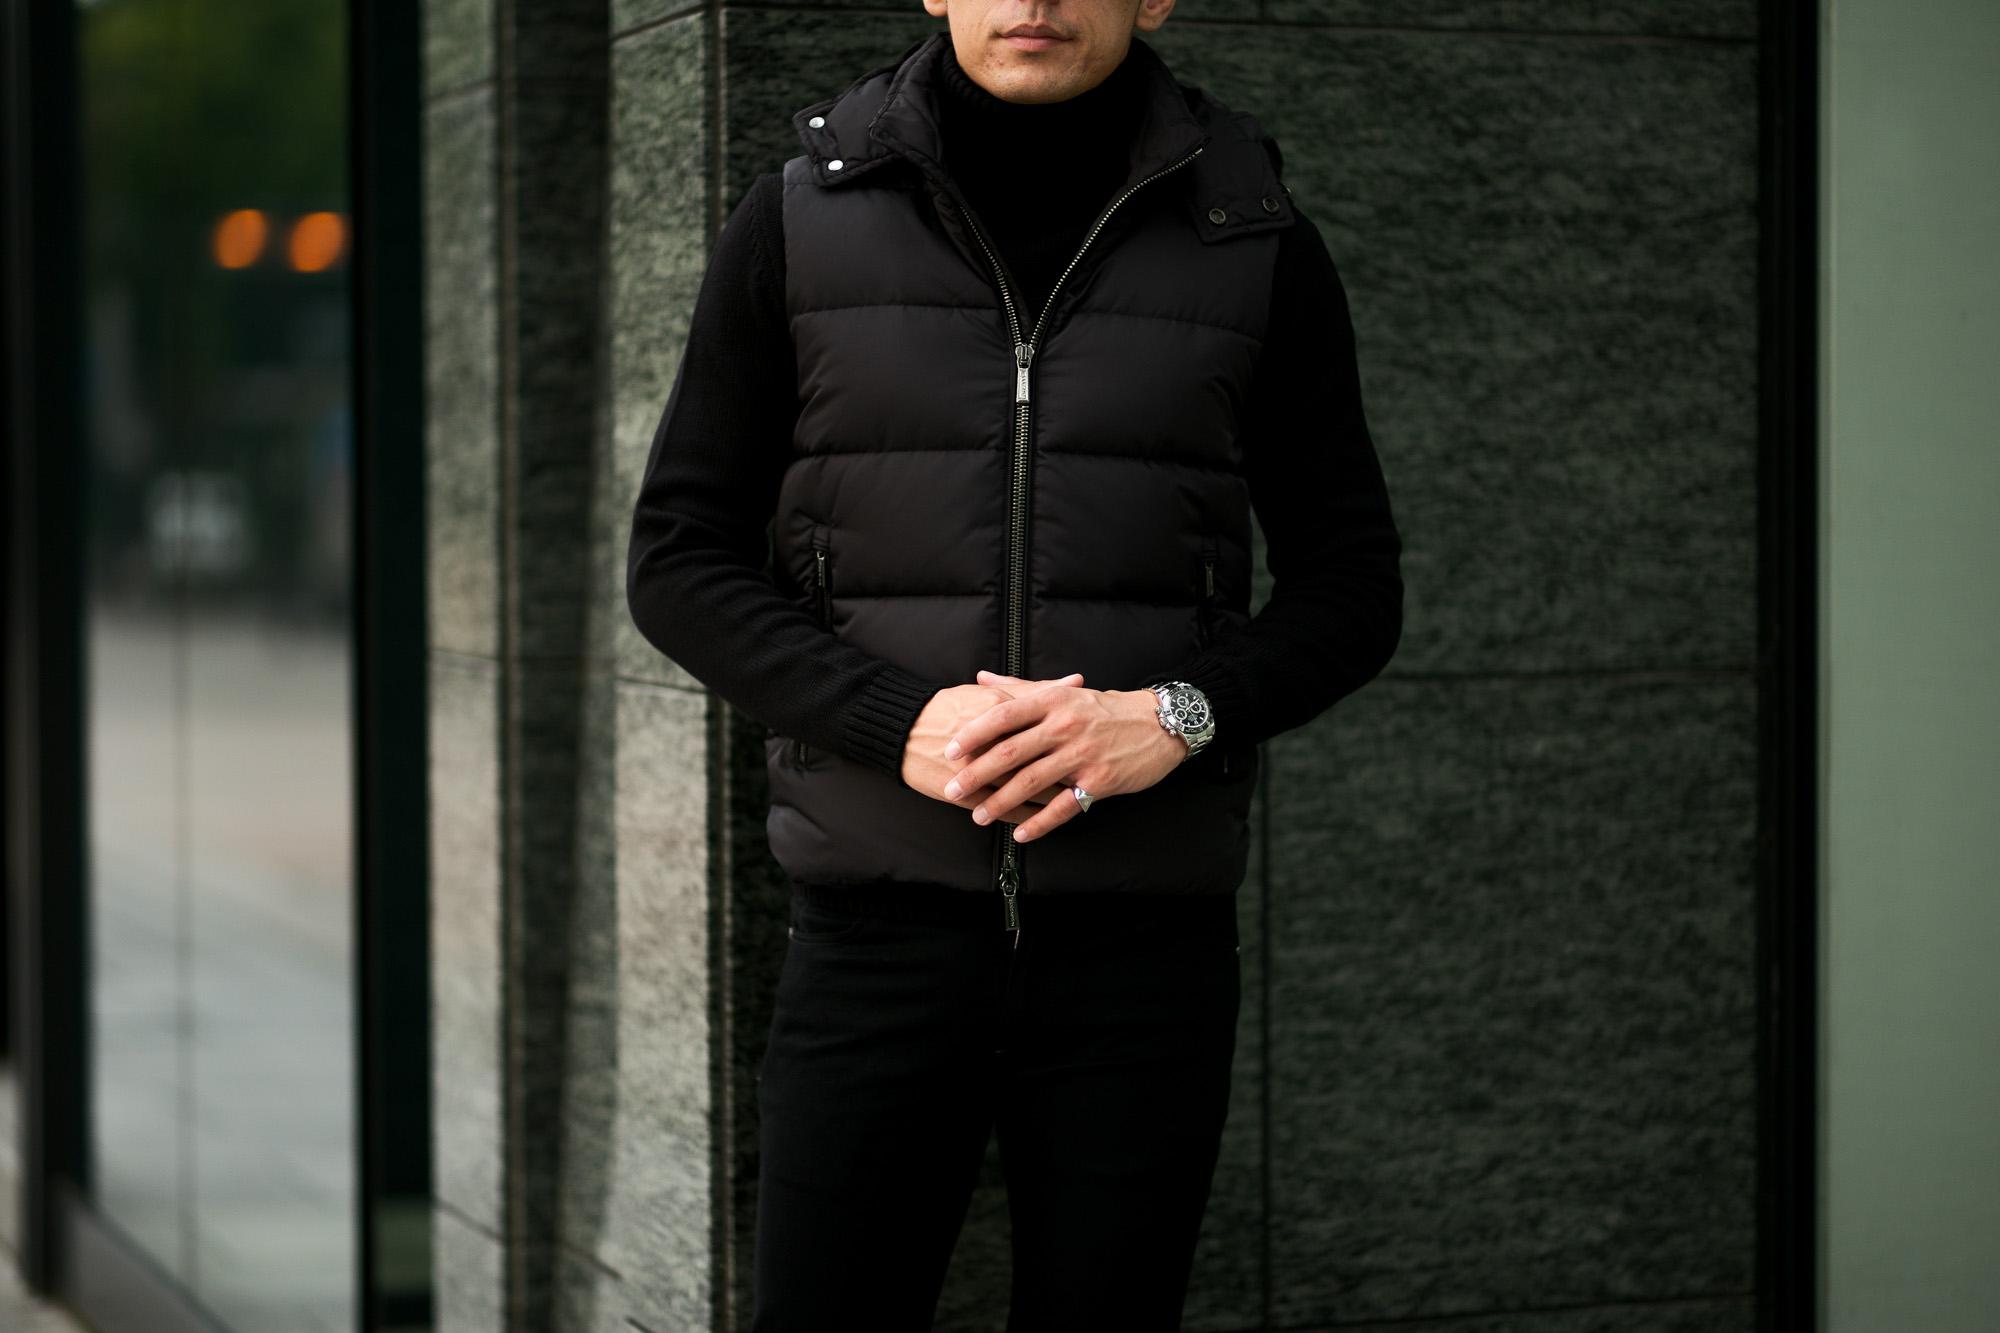 MOORER (ムーレー) FAYER (フェイヤー) Nylon Down Vest ナイロン ダウンベスト NERO(ブラック・08) Made in italy (イタリア製) 2021 秋冬 【ご予約受付中】 愛知 名古屋 Alto e Diritto altoediritto アルトエデリット